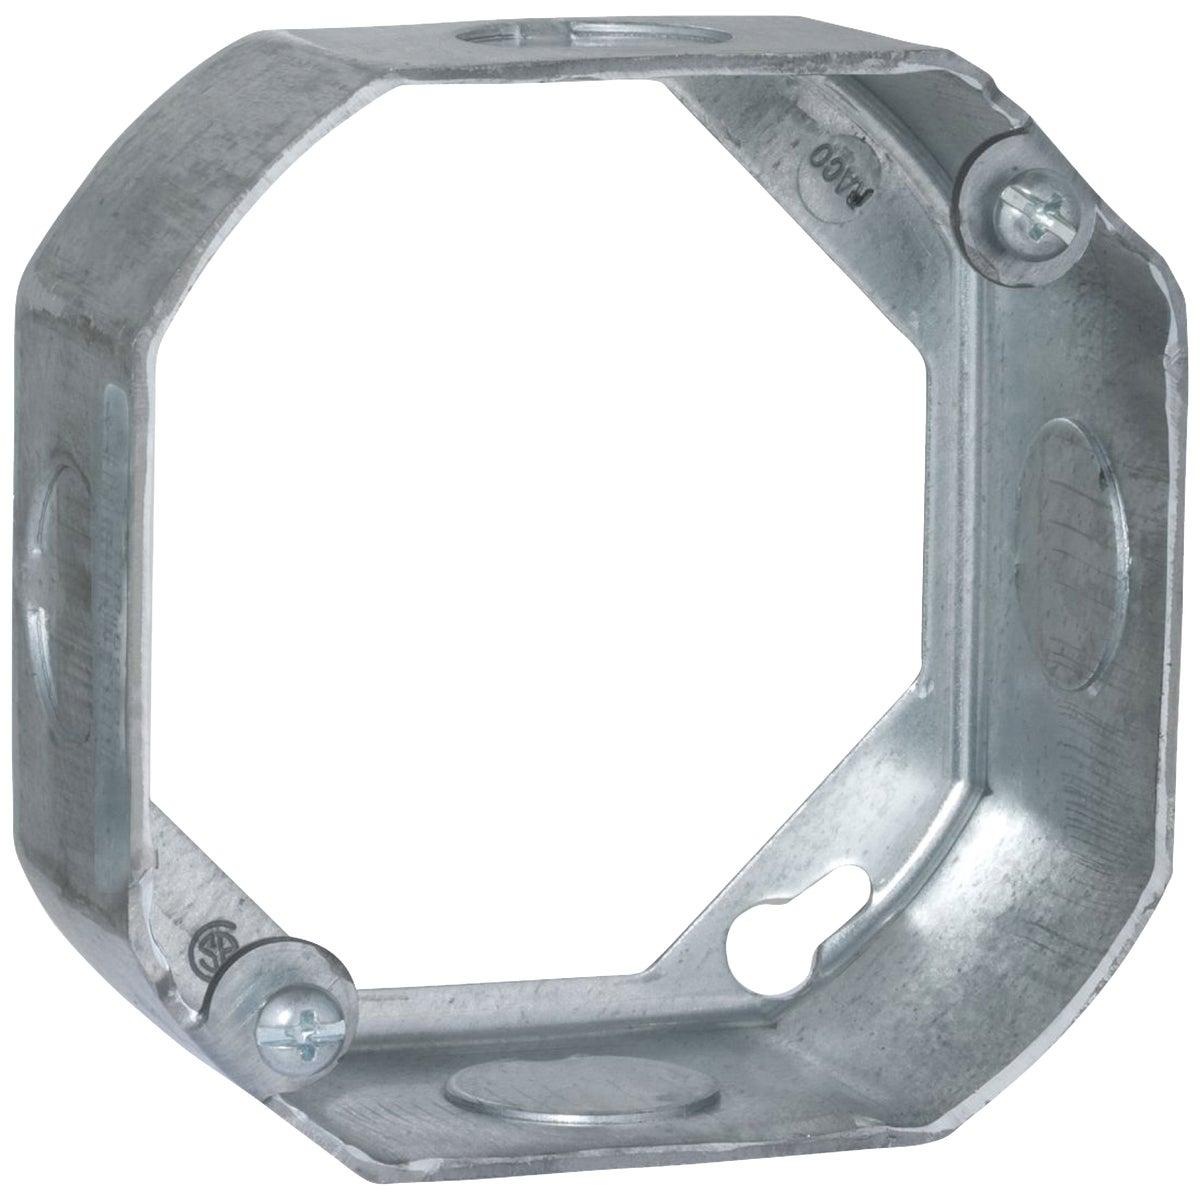 Octagon Box Extension